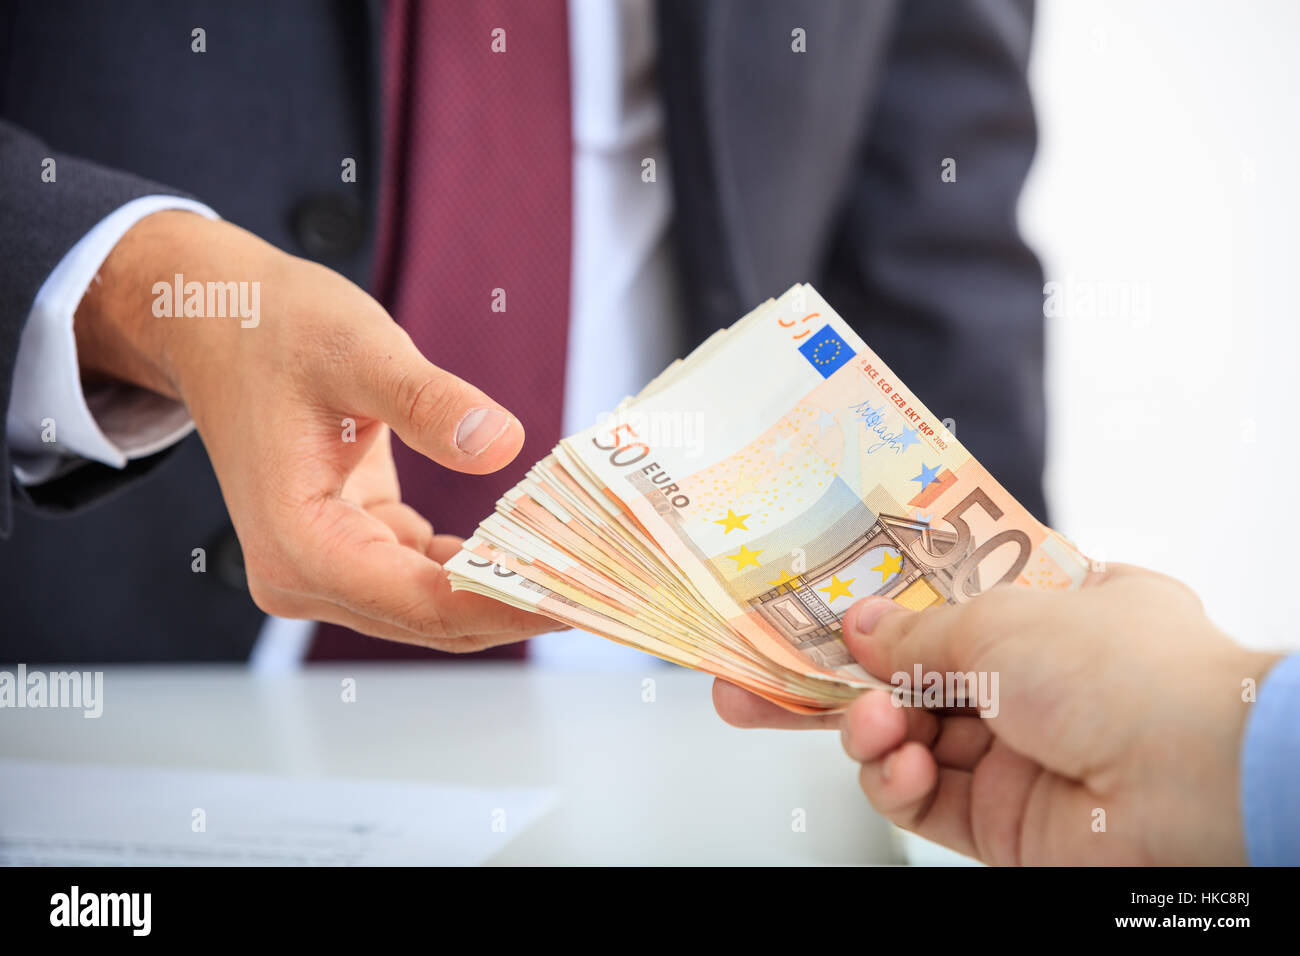 Mann im Anzug Geldeingang Stockfoto, Bild: 132421398 - Alamy